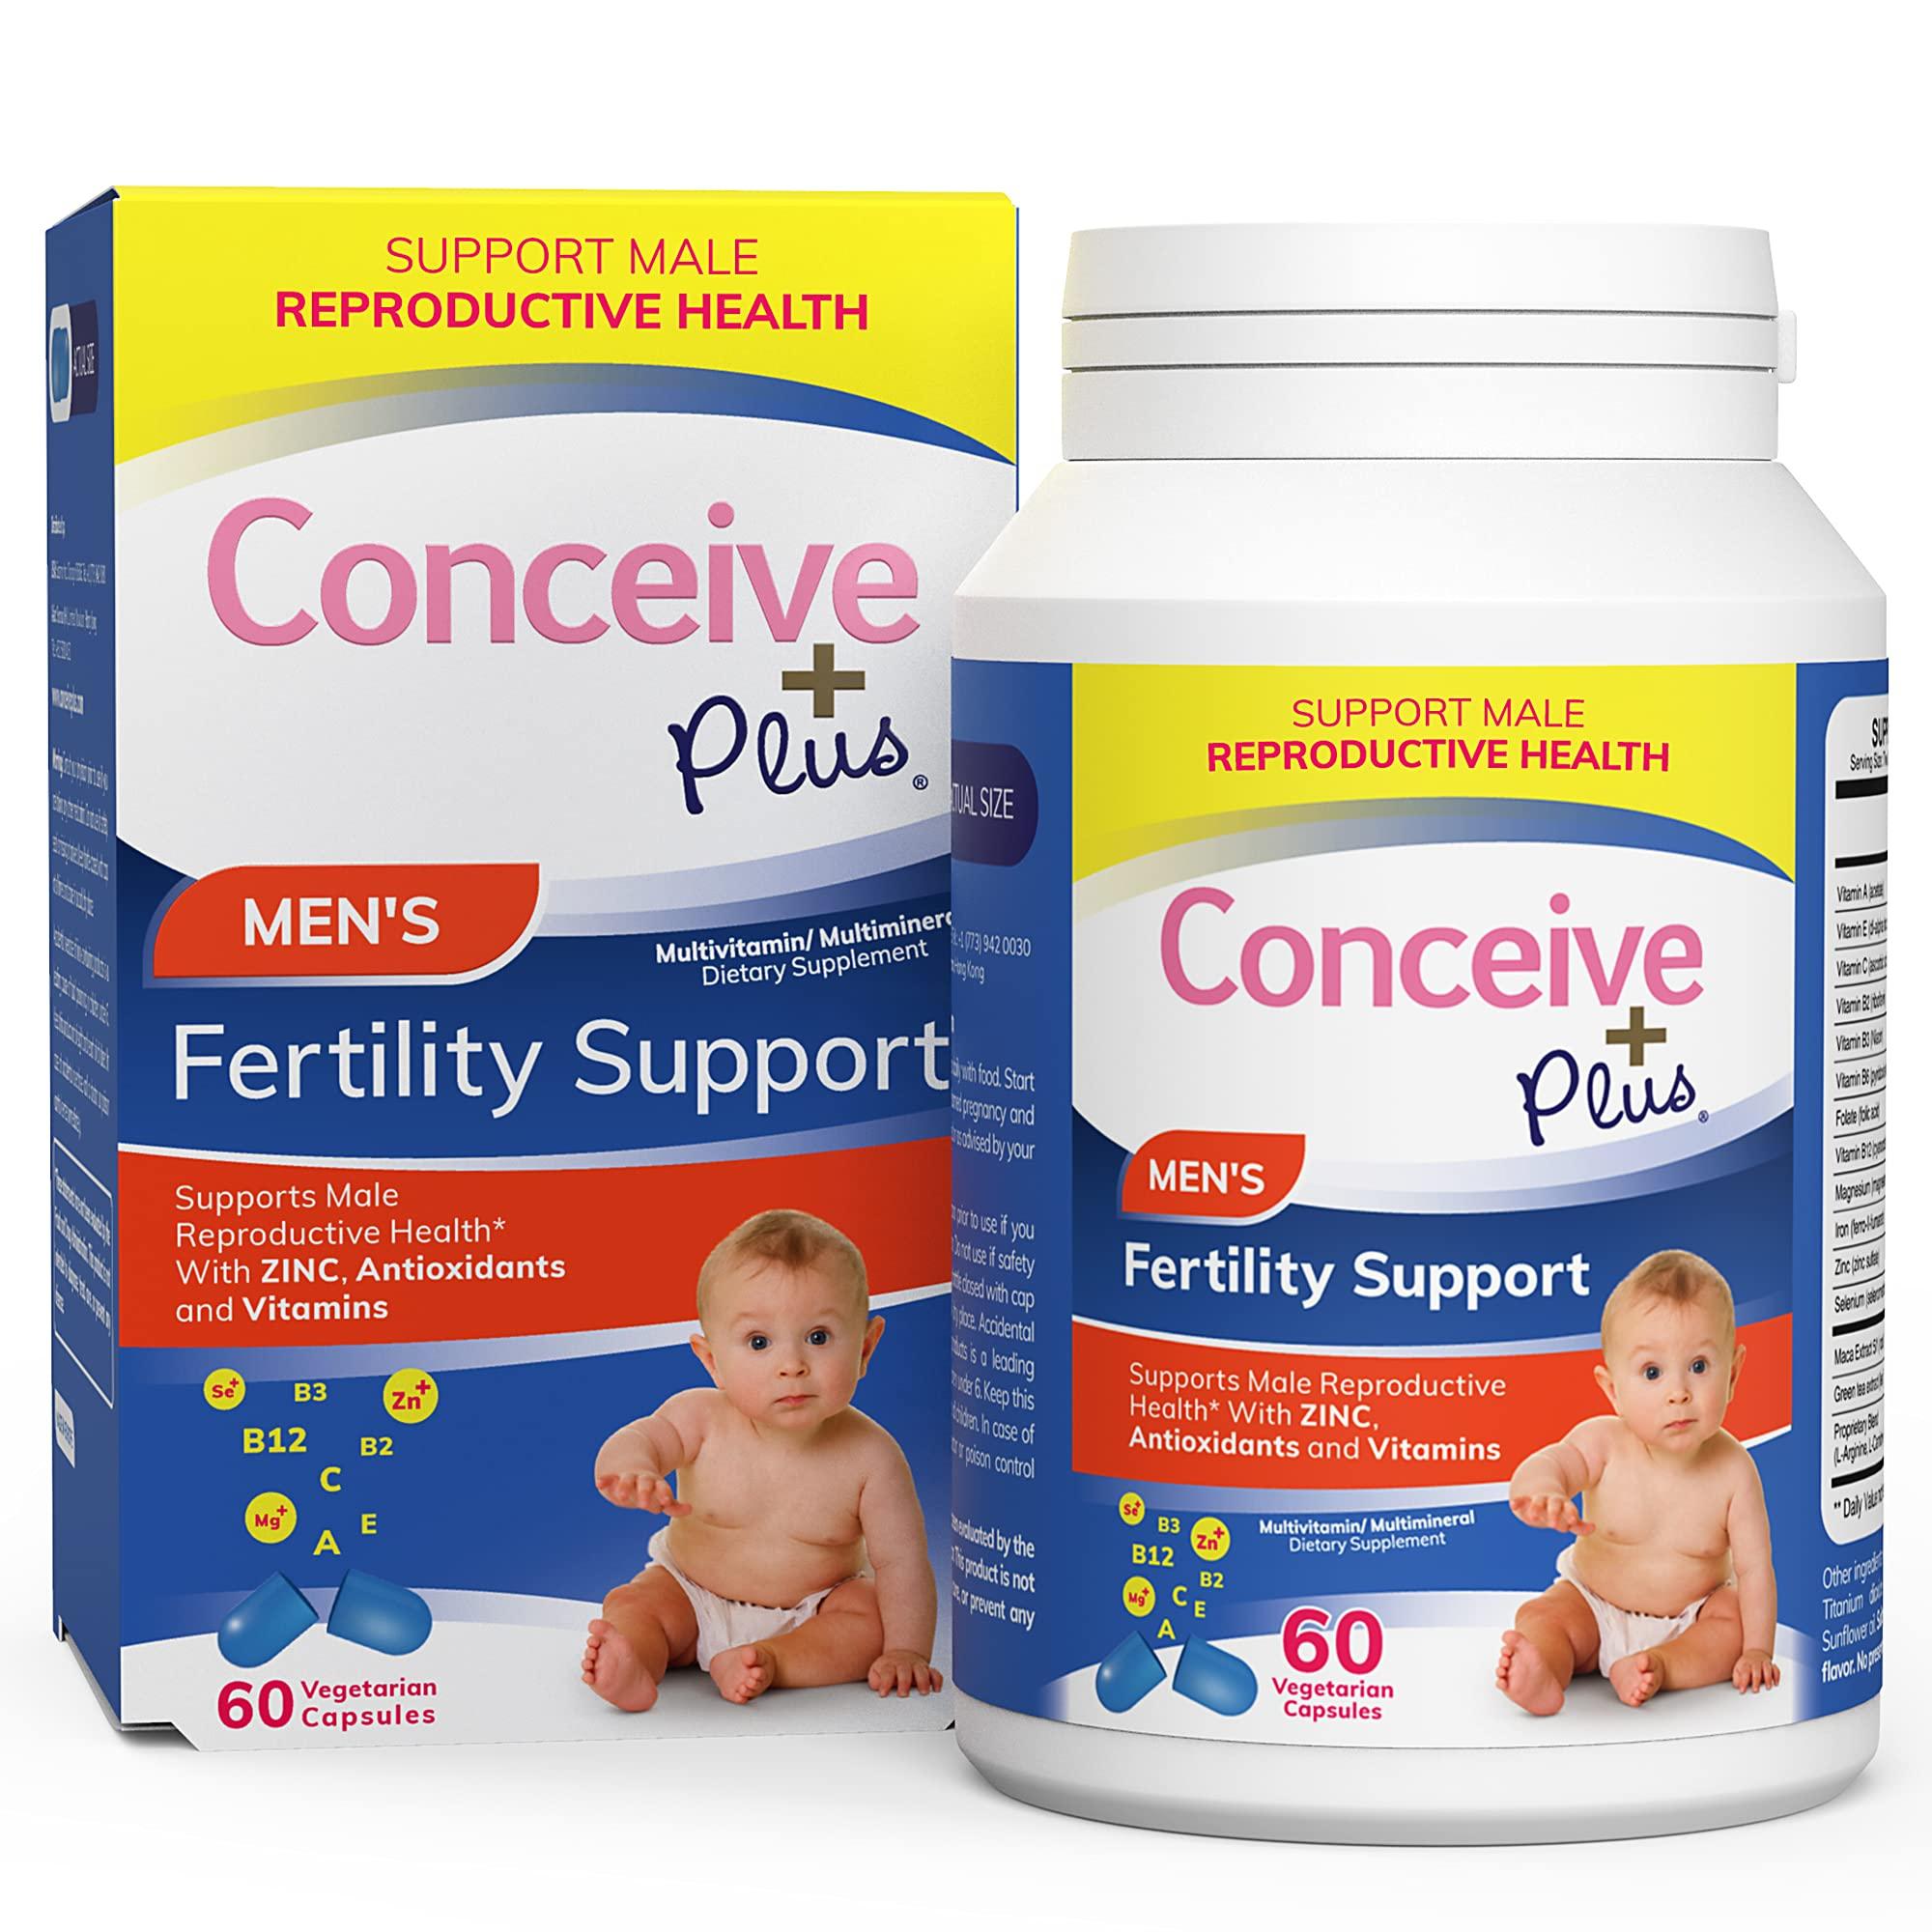 CONCEIVE PLUS Fertility Supplements for Men | 30-Day Supply | Zinc, Folate, Maca Root, Selenium | Semen Volumizer | Male Fertility Support Pills (60 Capsules)